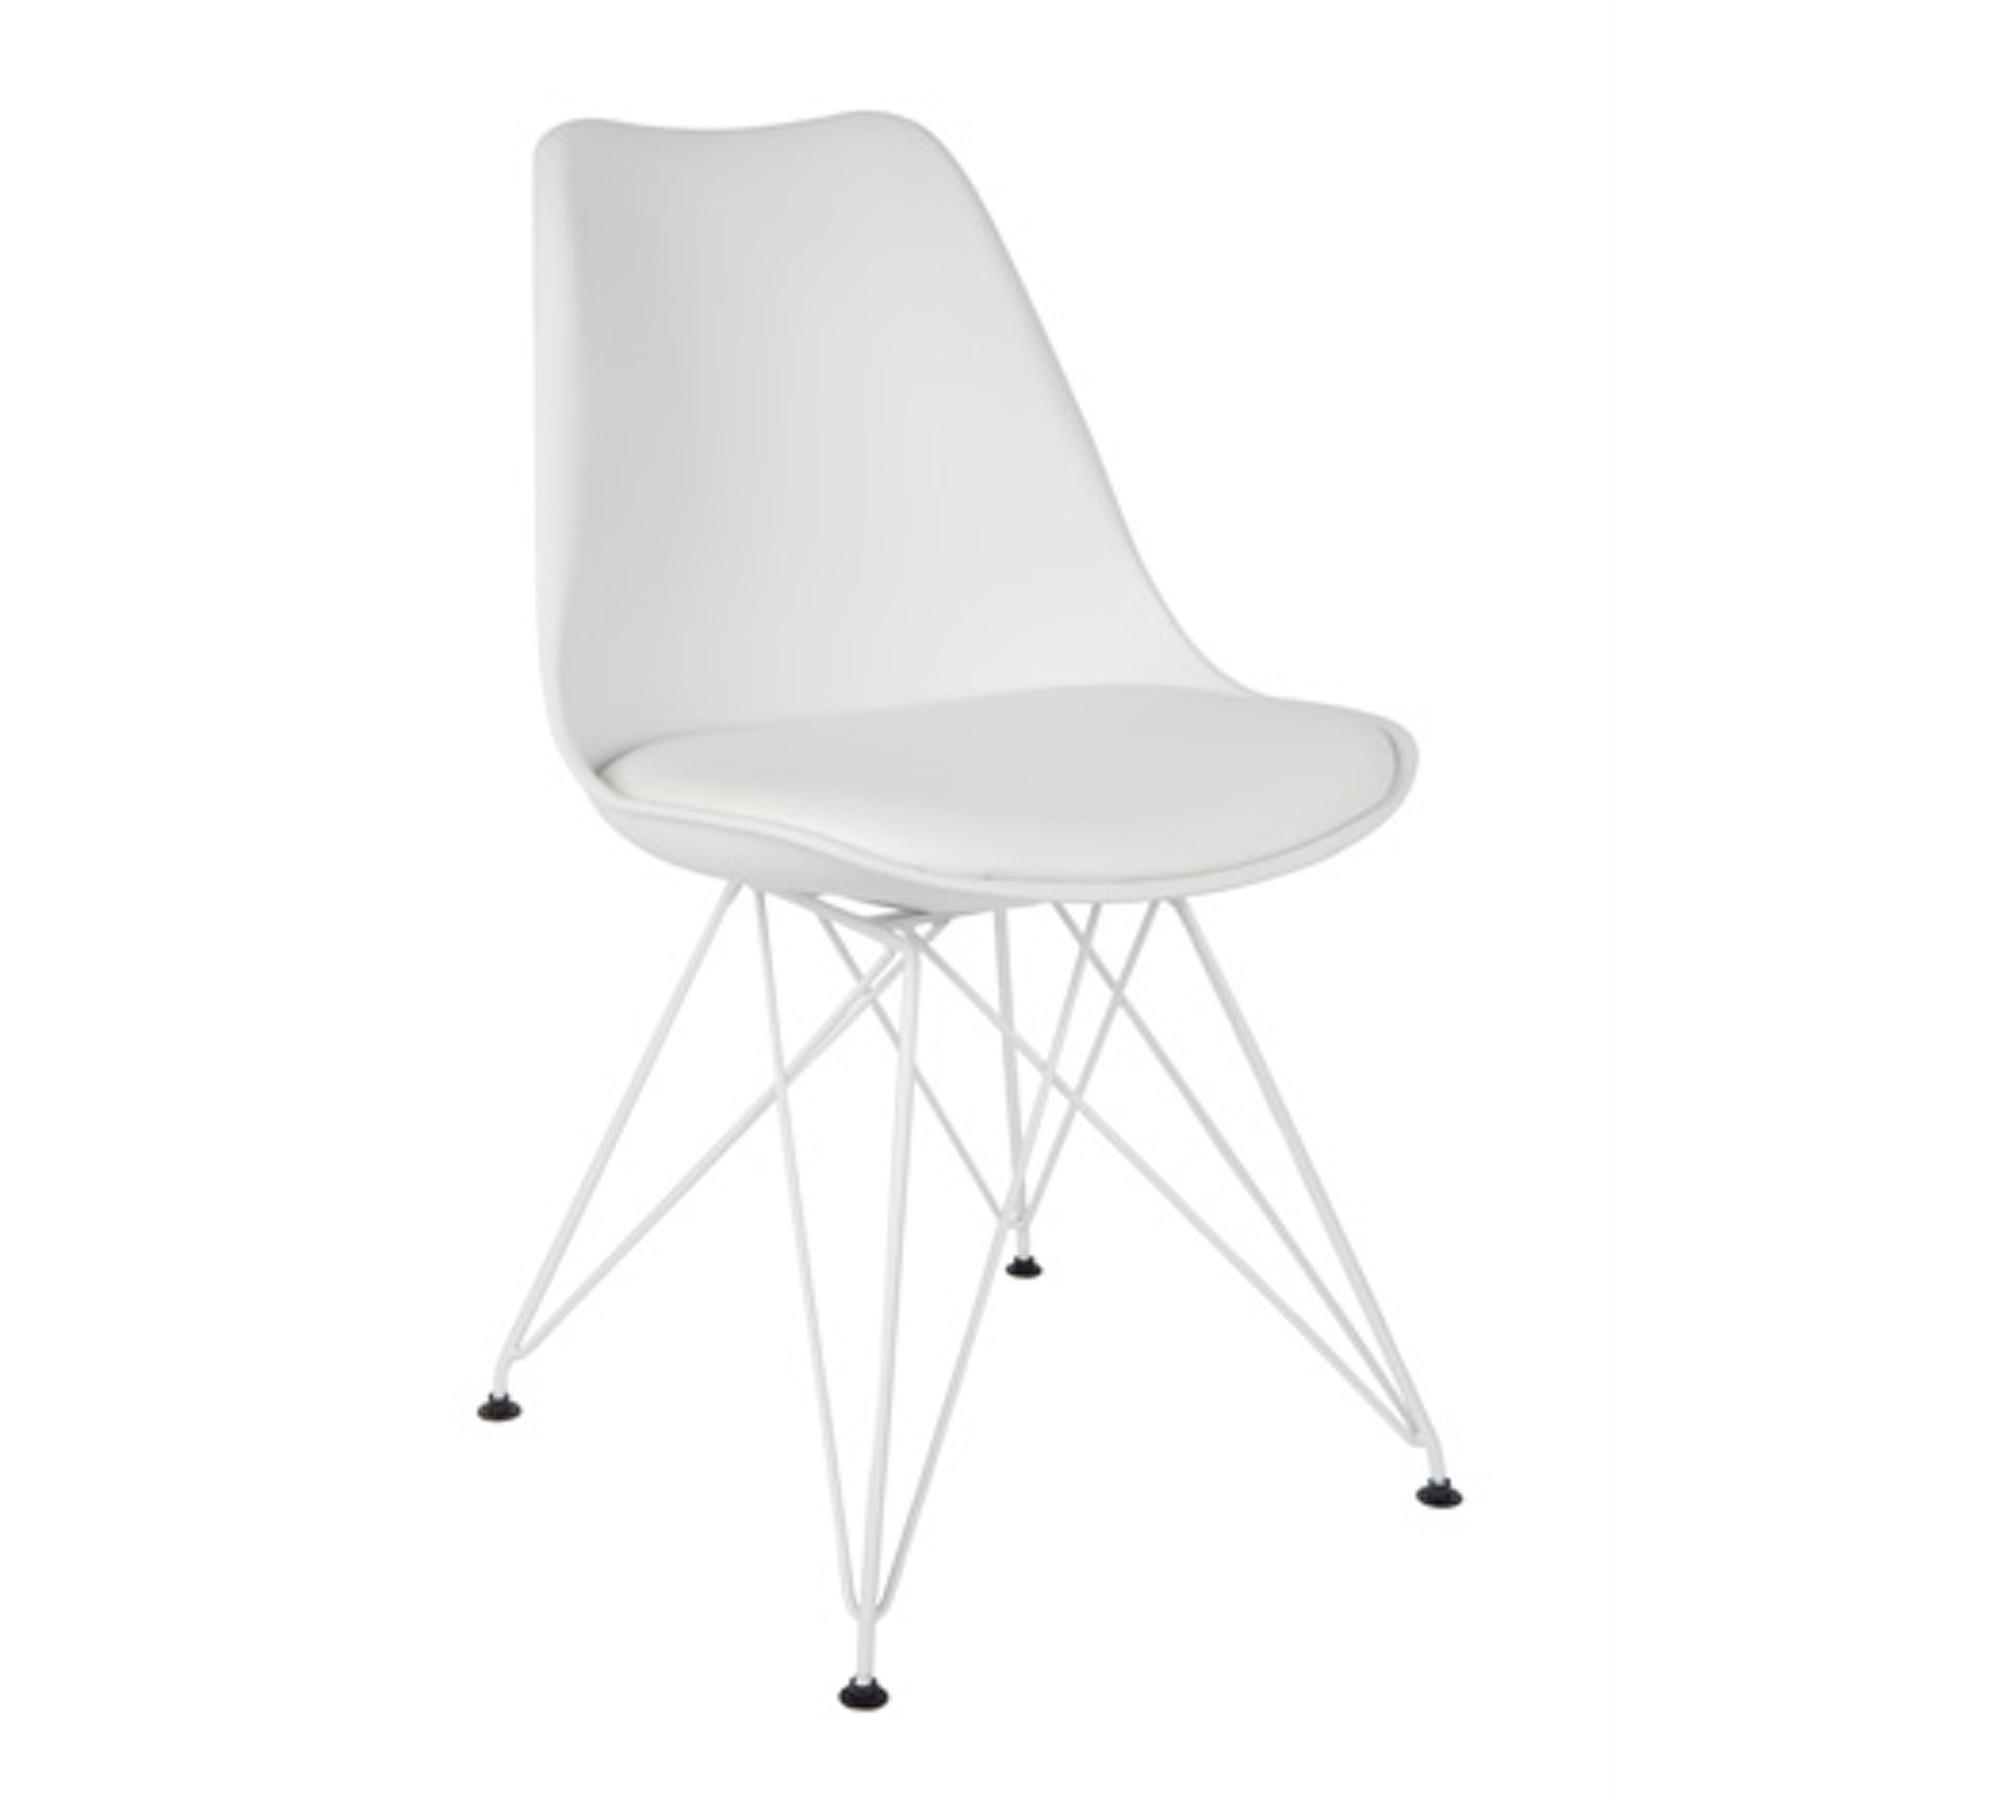 zuiver stuhl ozzy wei mit metallgestell im 2er set 10008301. Black Bedroom Furniture Sets. Home Design Ideas